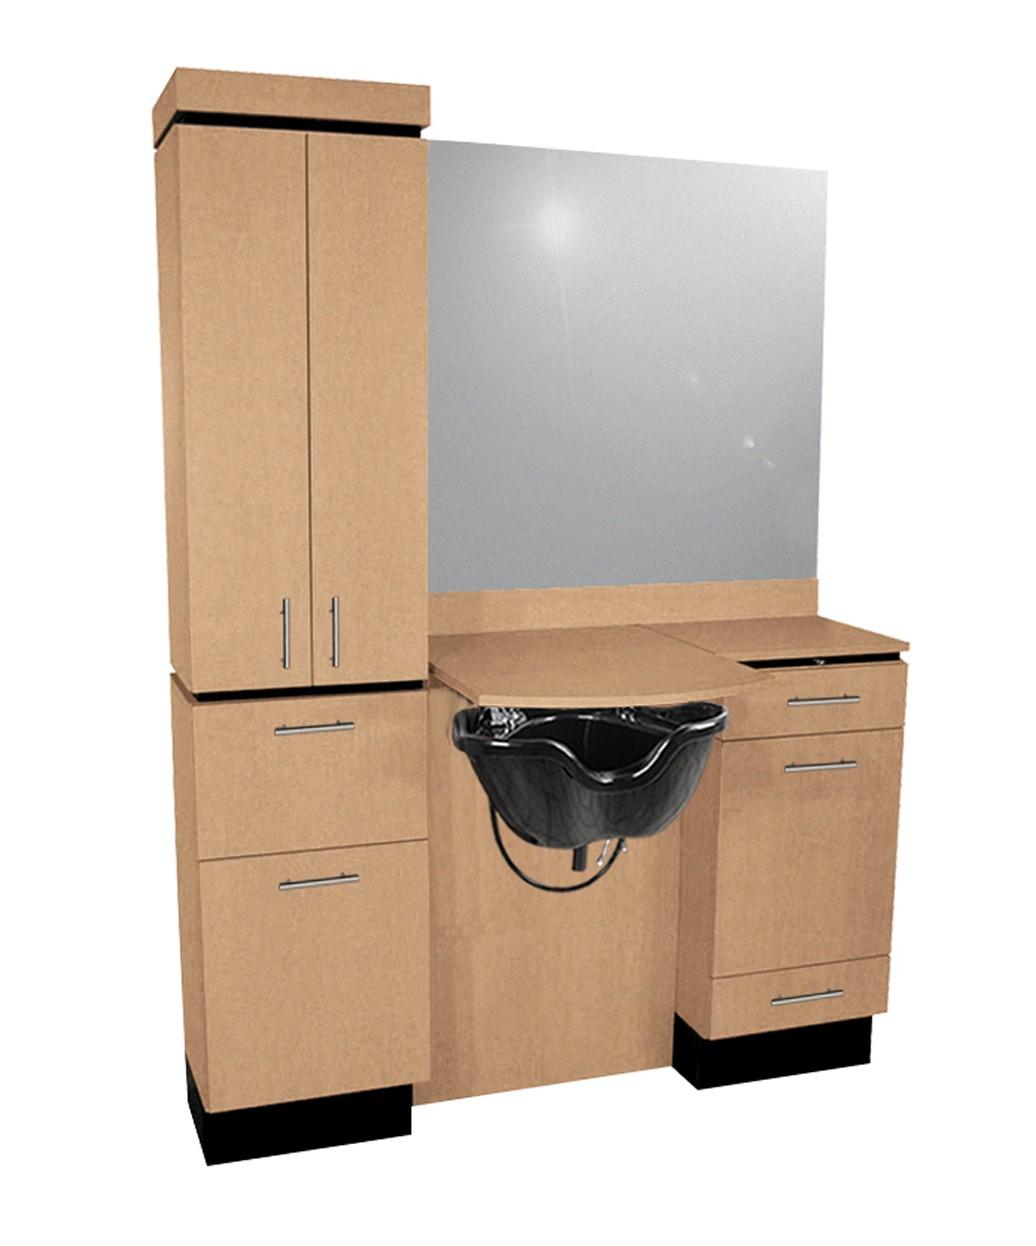 Collins QSE 4424-60 Neo Superior Wet Booth Unit